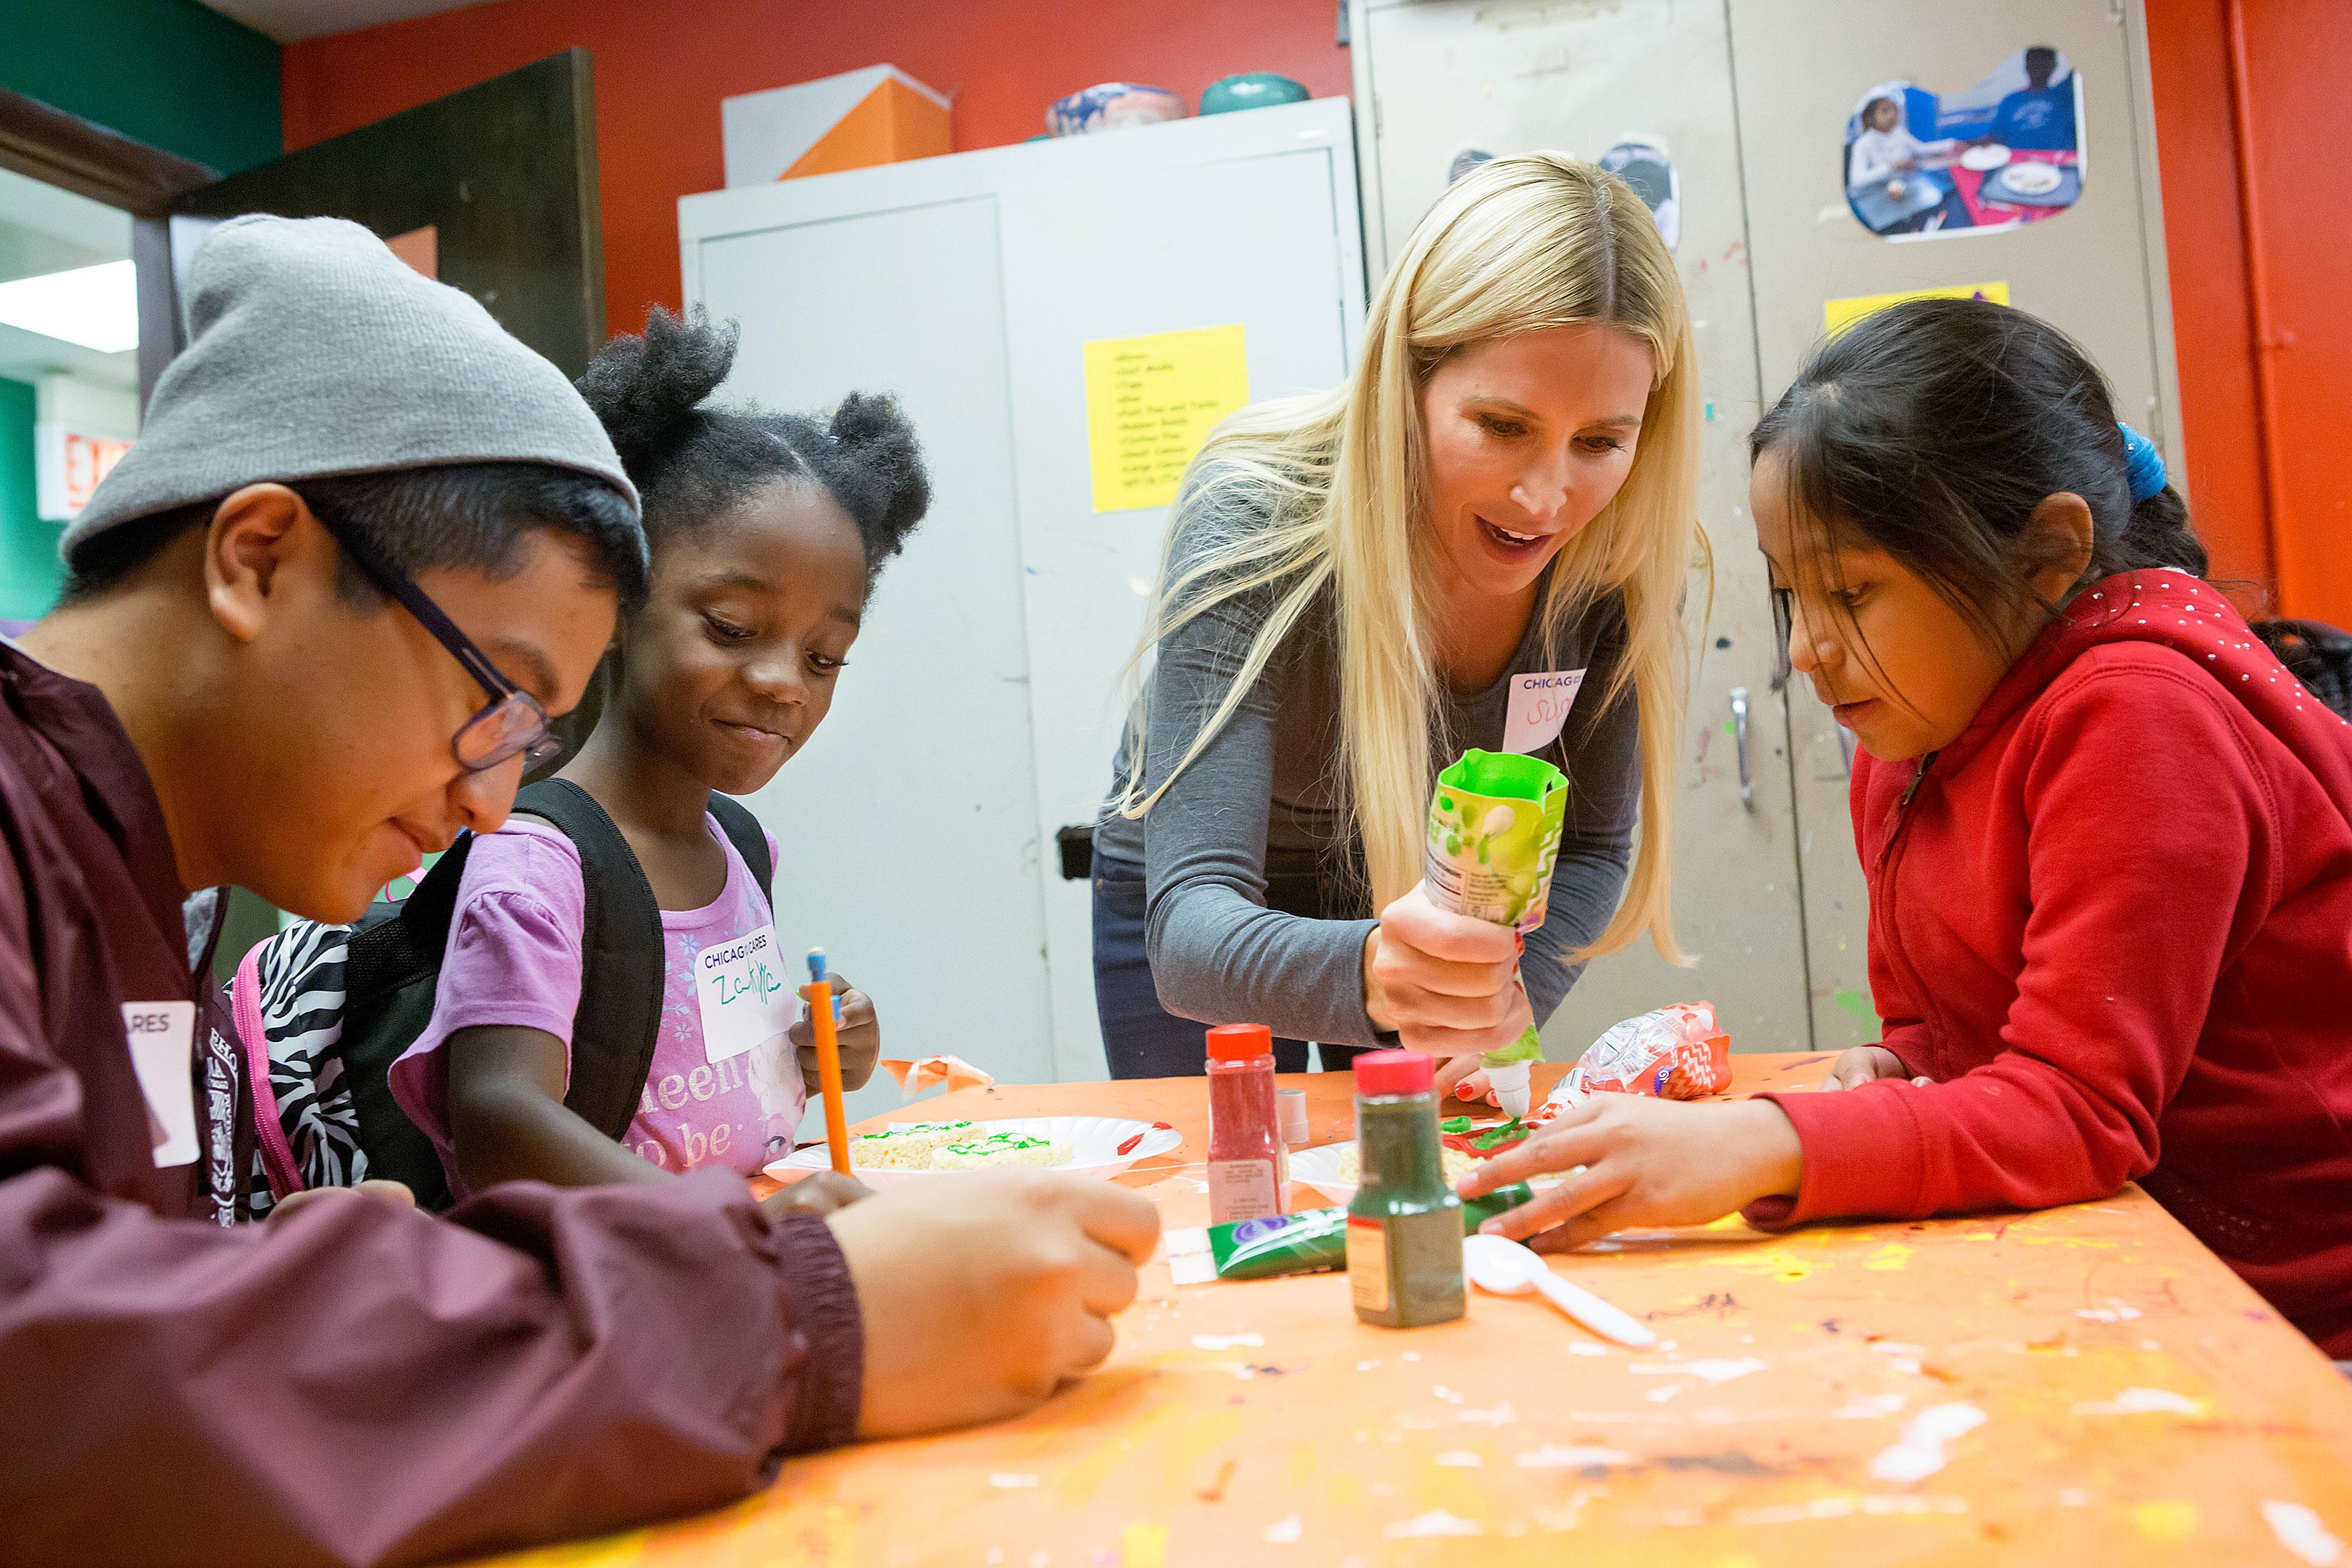 We Believe in the power of Volunteering to transform Chicago.